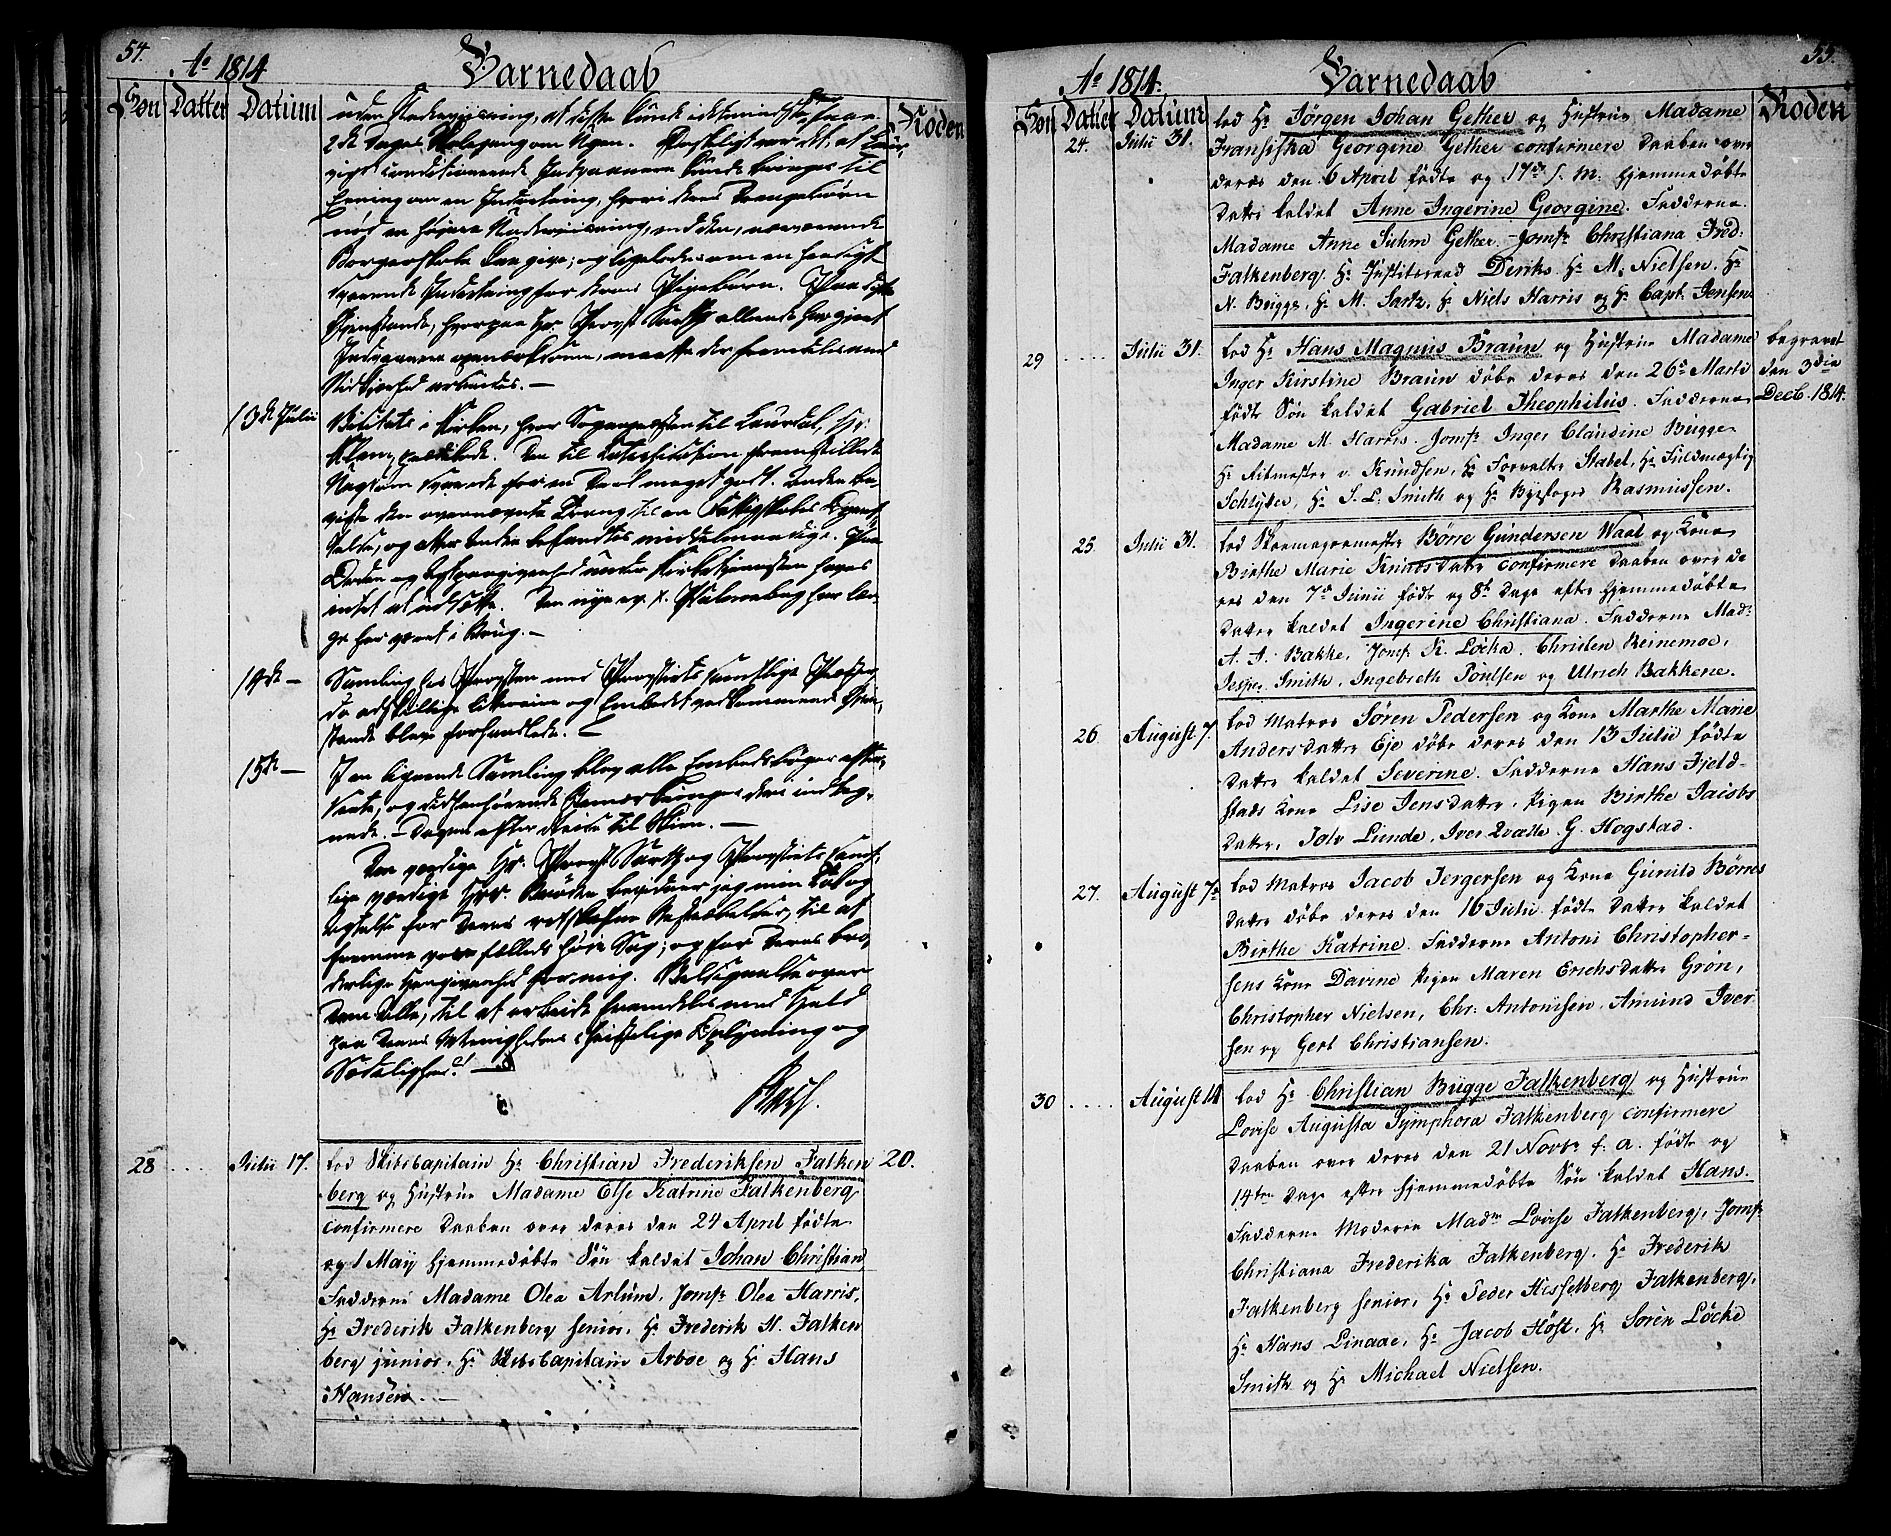 SAKO, Larvik kirkebøker, G/Ga/L0002: Klokkerbok nr. I 2, 1807-1830, s. 54-55